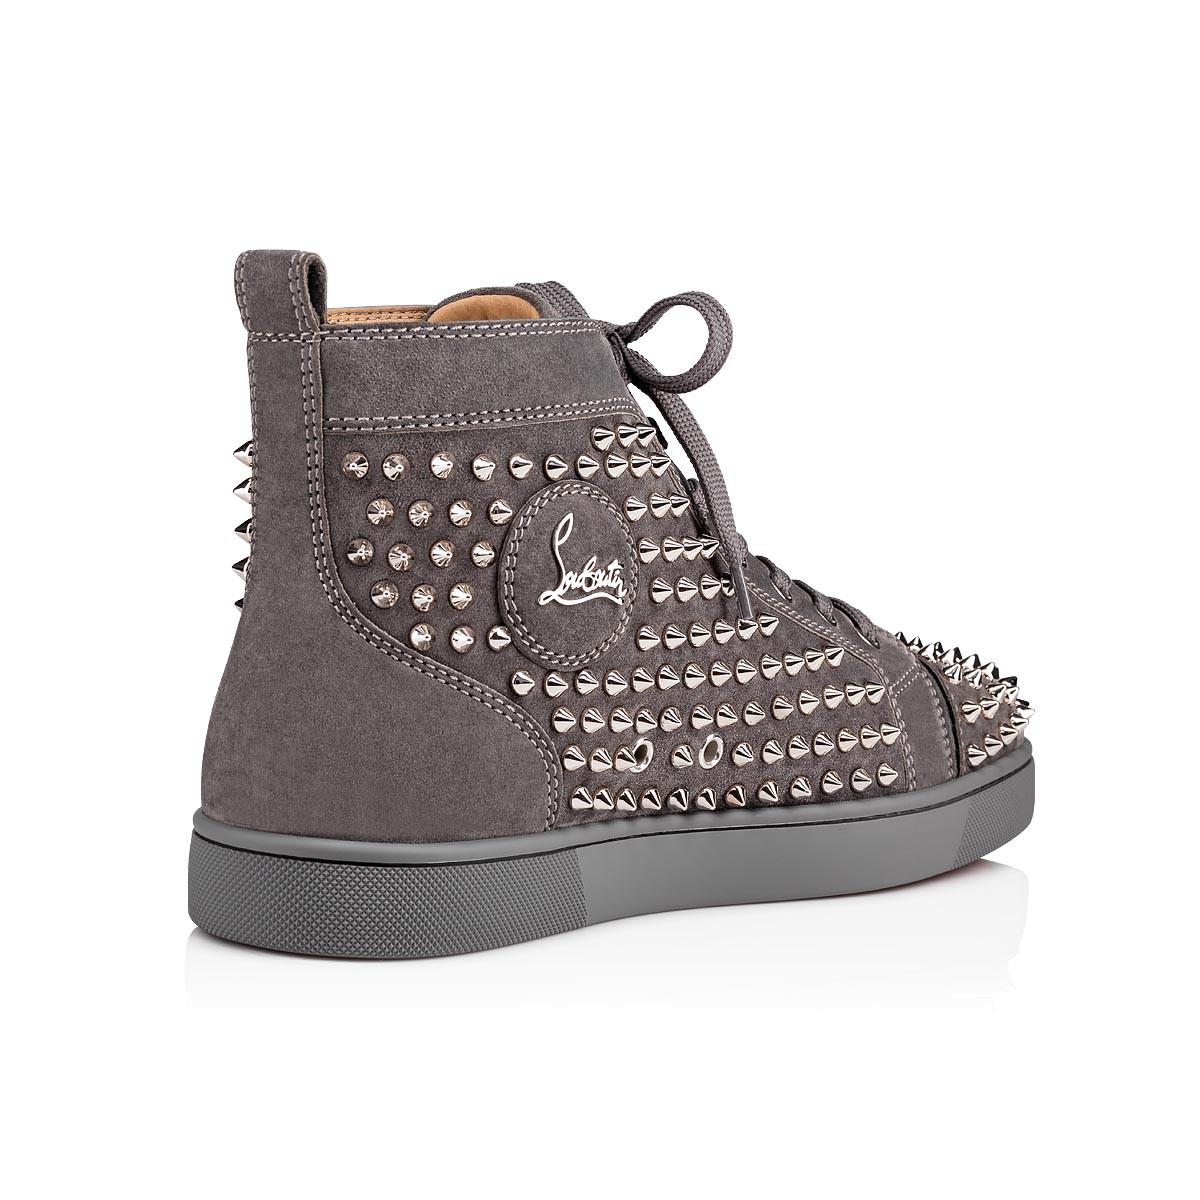 Shoes - Louis - Christian Louboutin